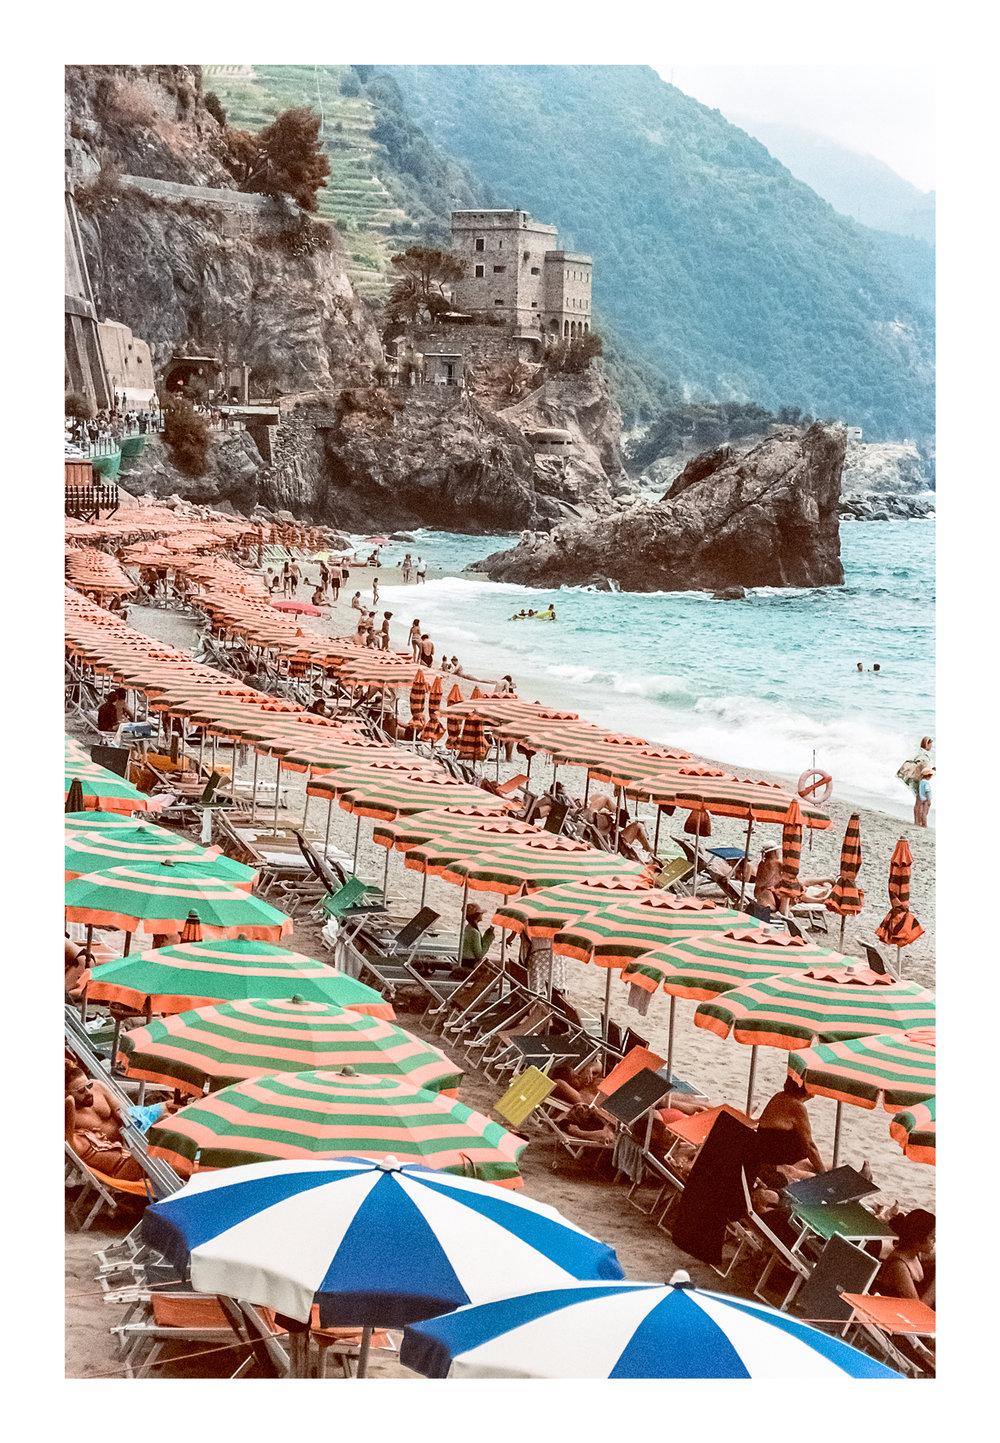 Italy-web-2.jpg